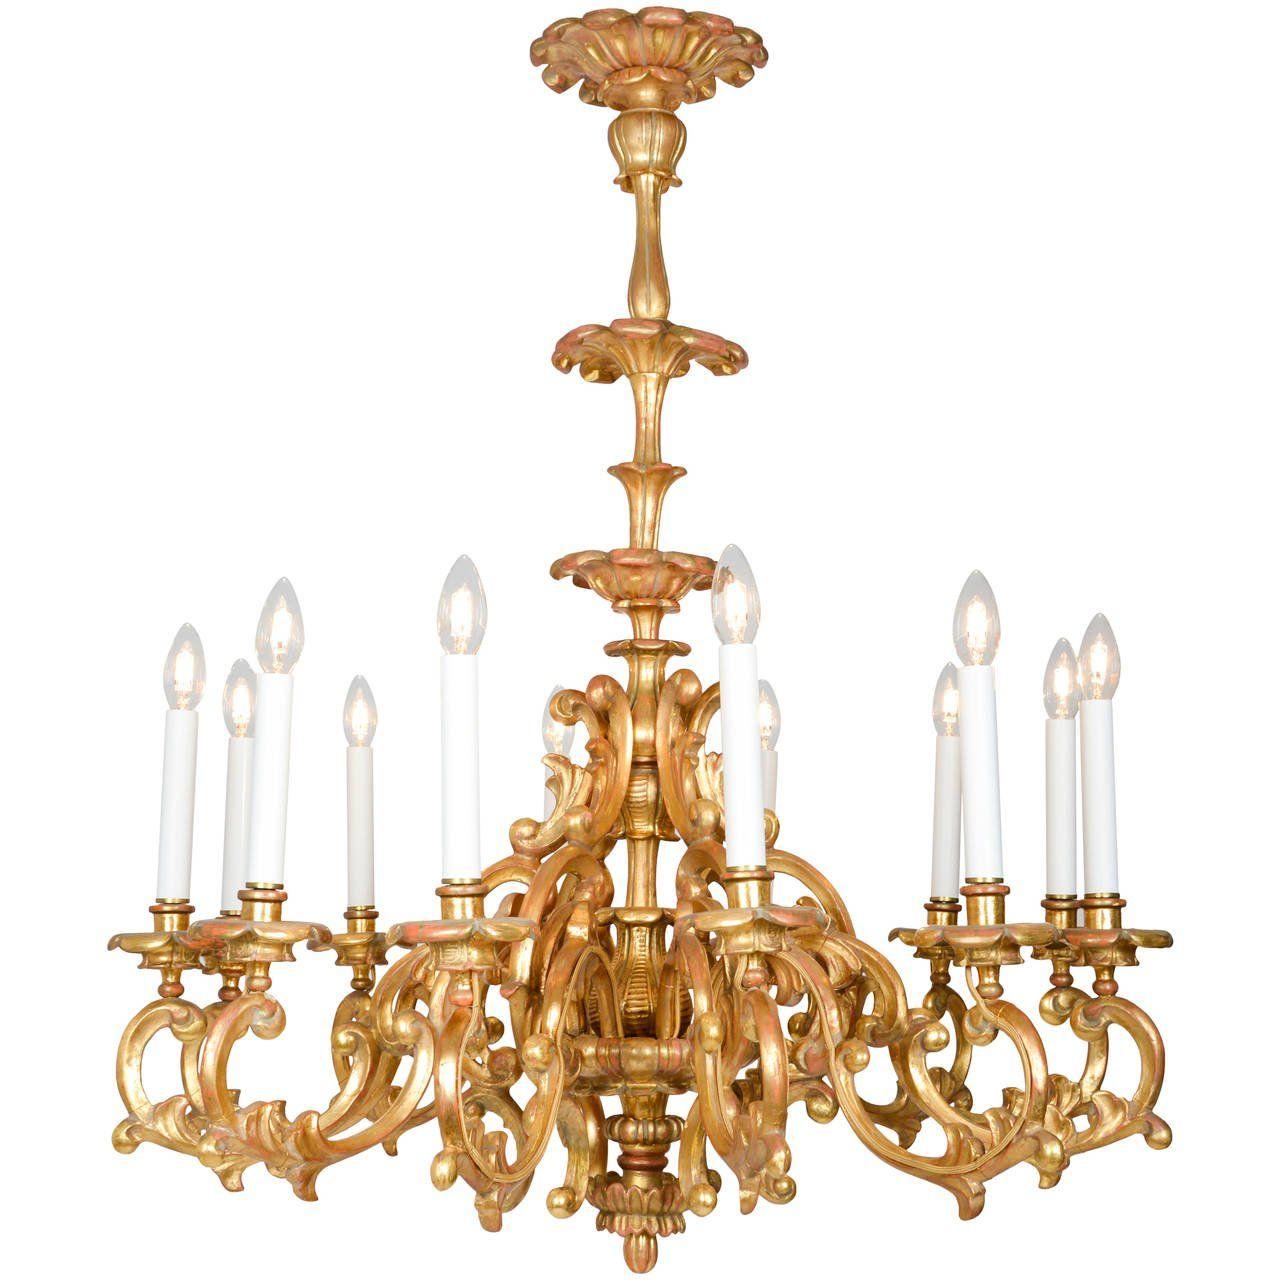 Baroque style twelve light giltwood chandelier pendant for Modern baroque style